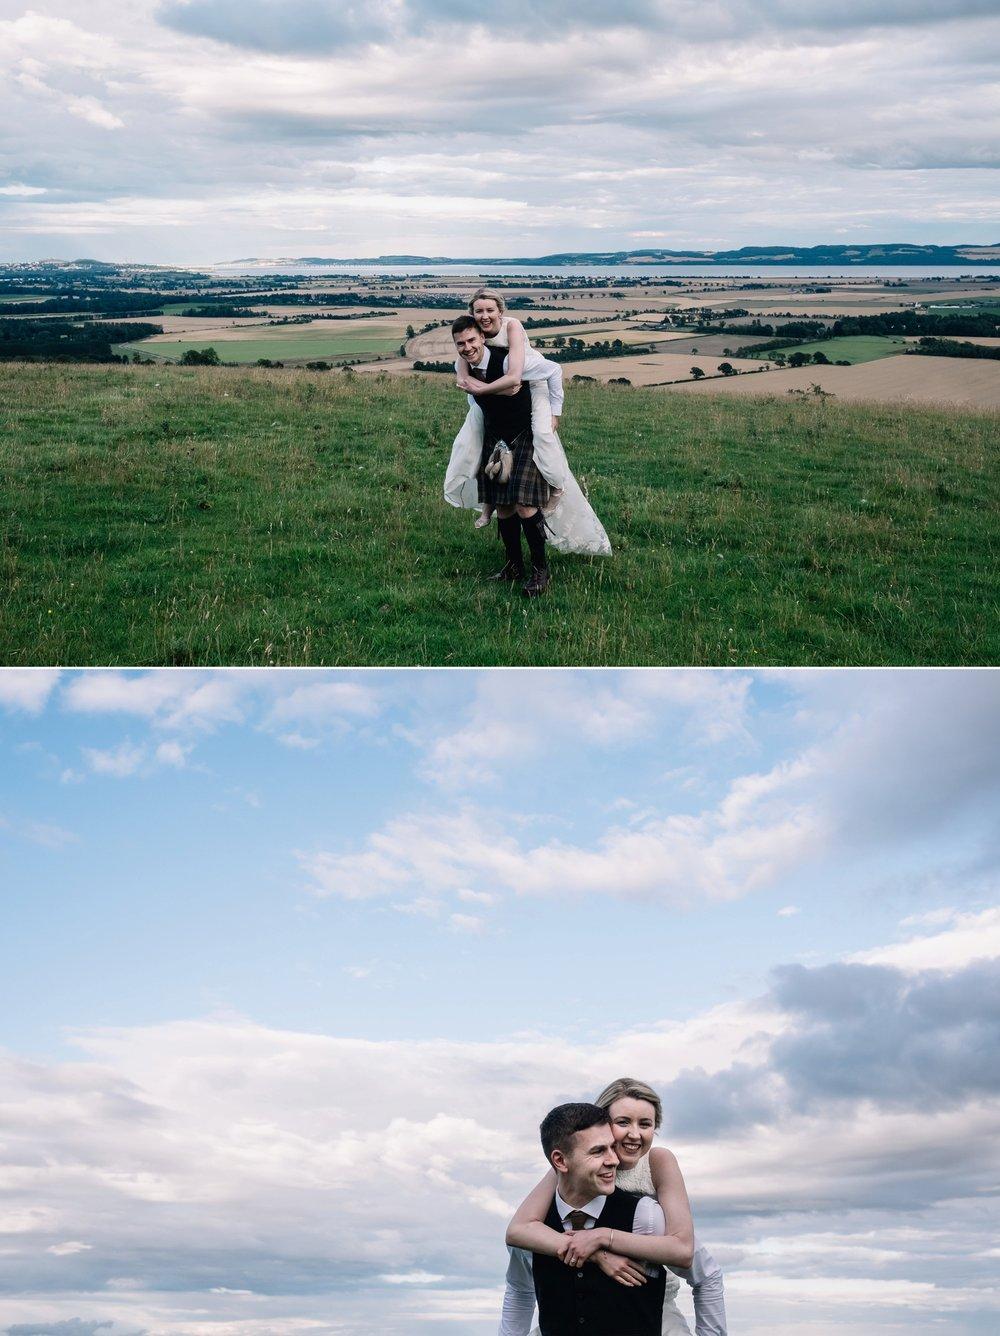 492-Rebeca-Tom-Wedding-Guardswell.JPG